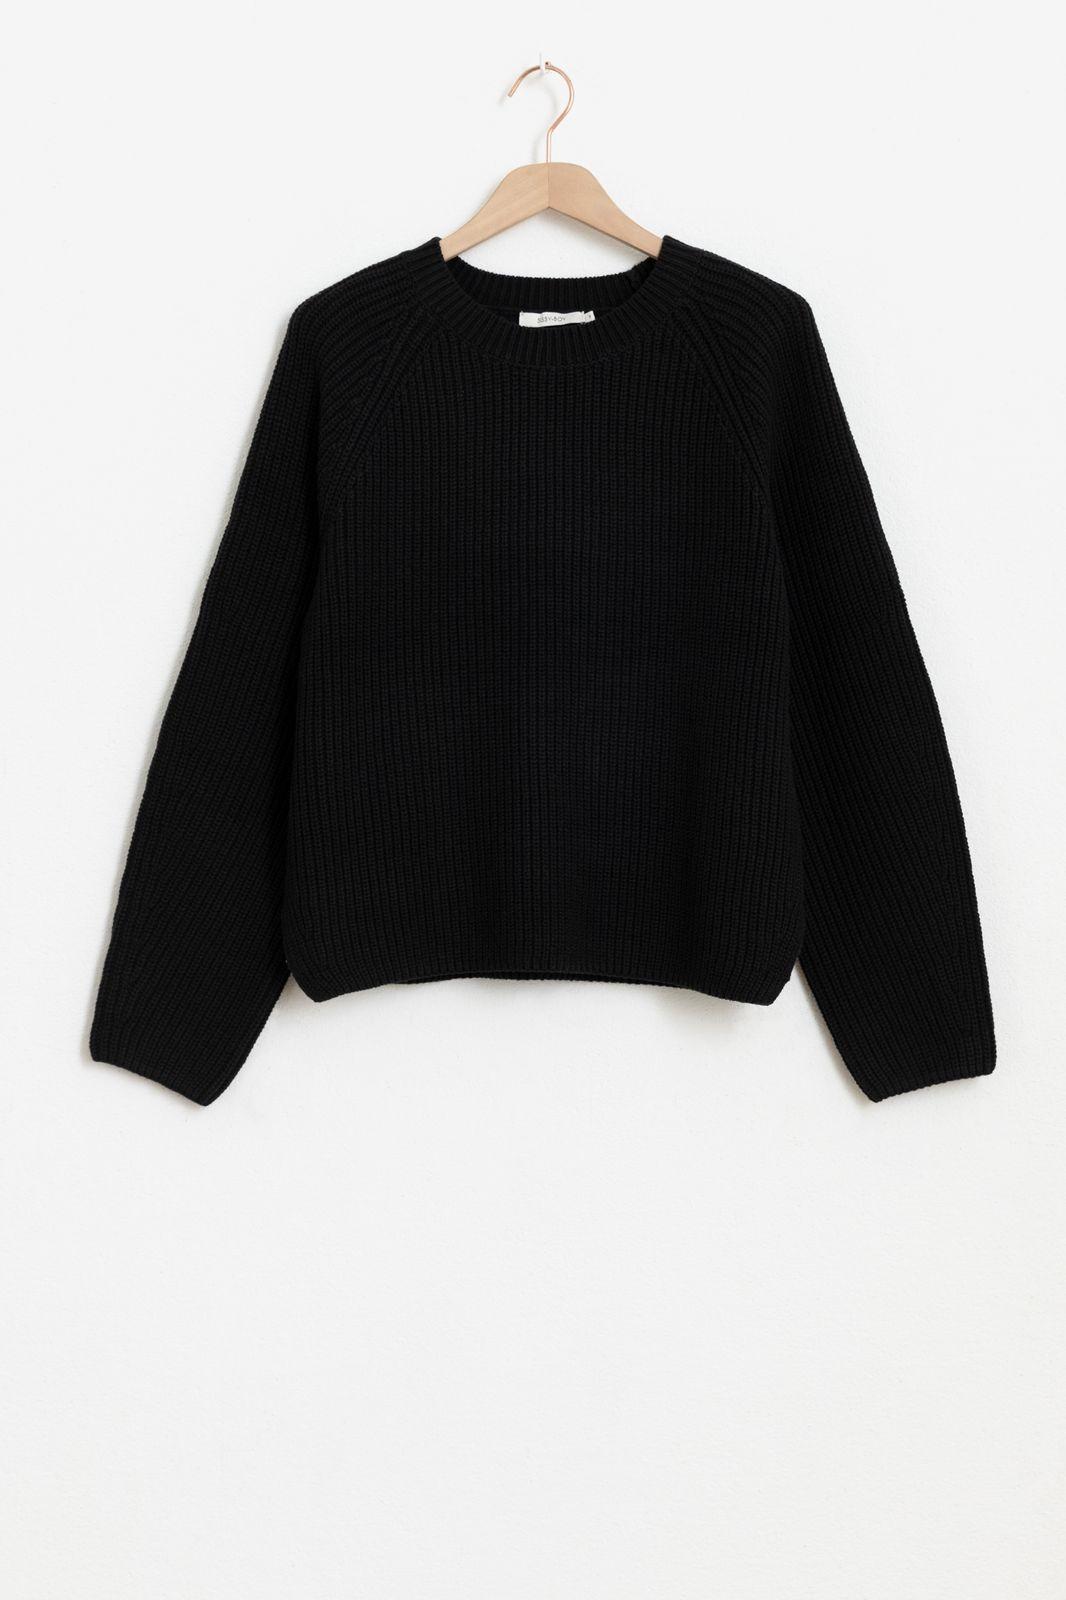 Zwarte rib trui met ronde hals